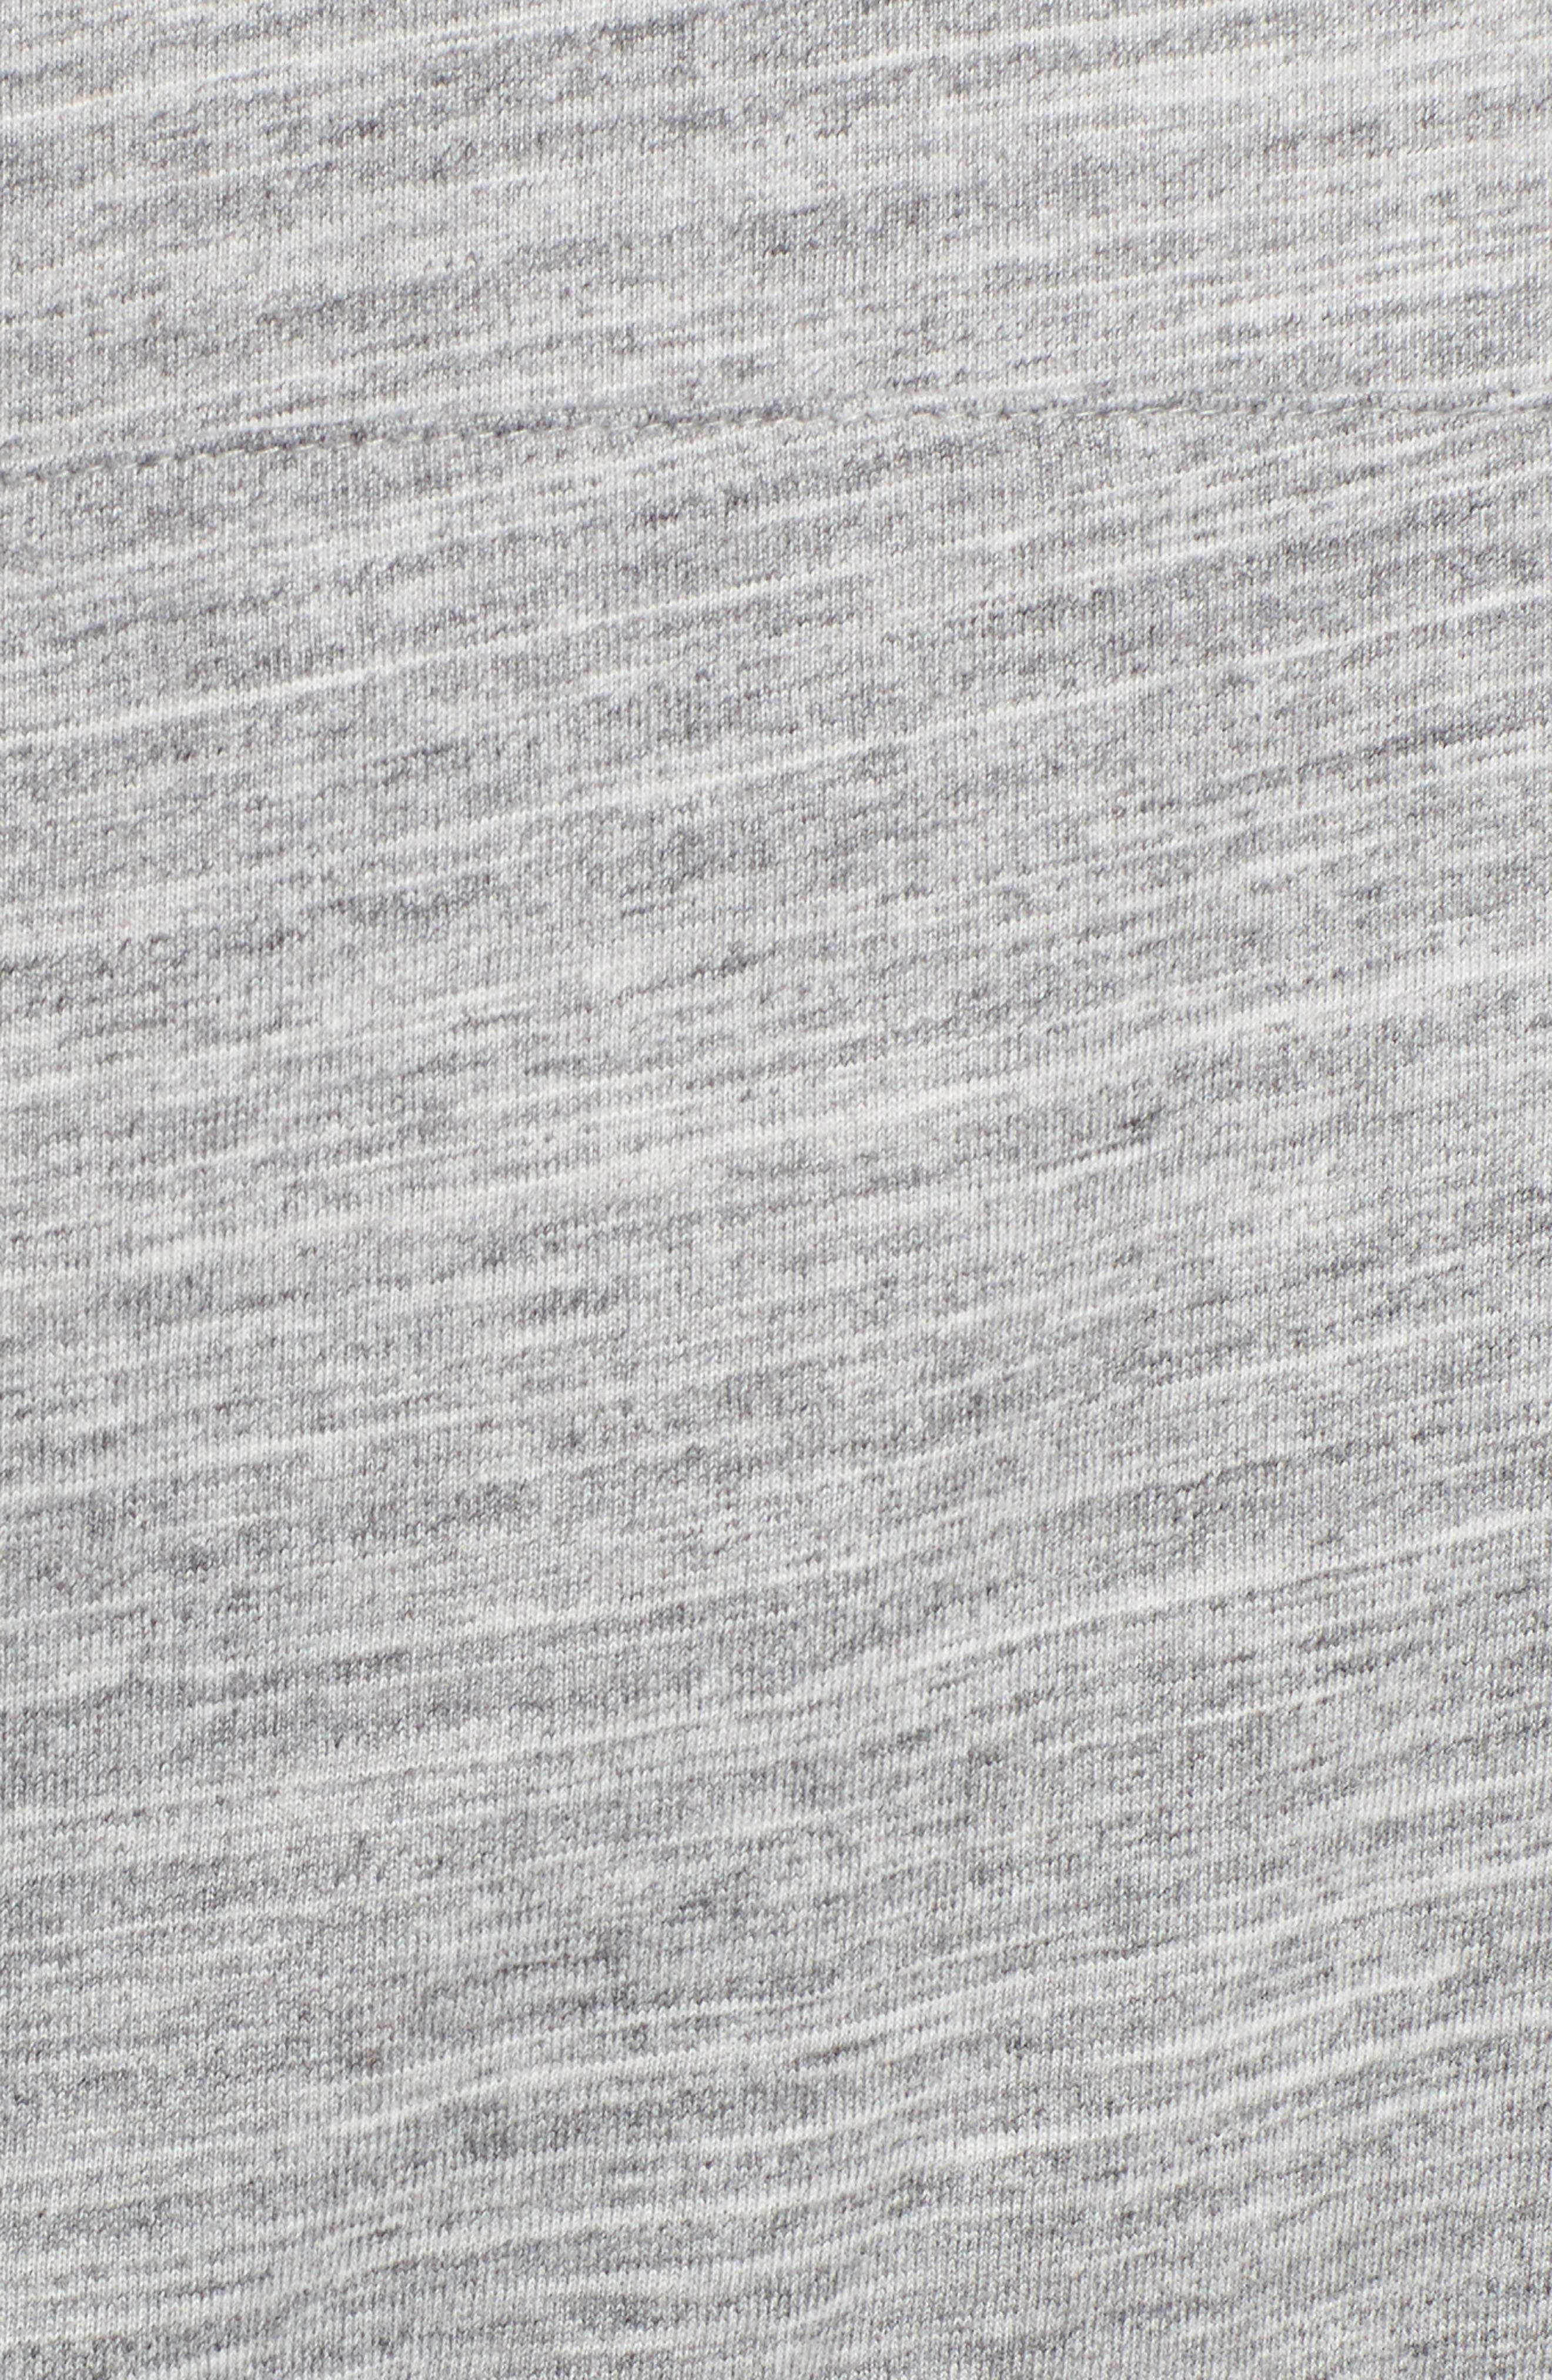 Revolve Denver Broncos Hoodie,                             Alternate thumbnail 5, color,                             Space Dye Grey